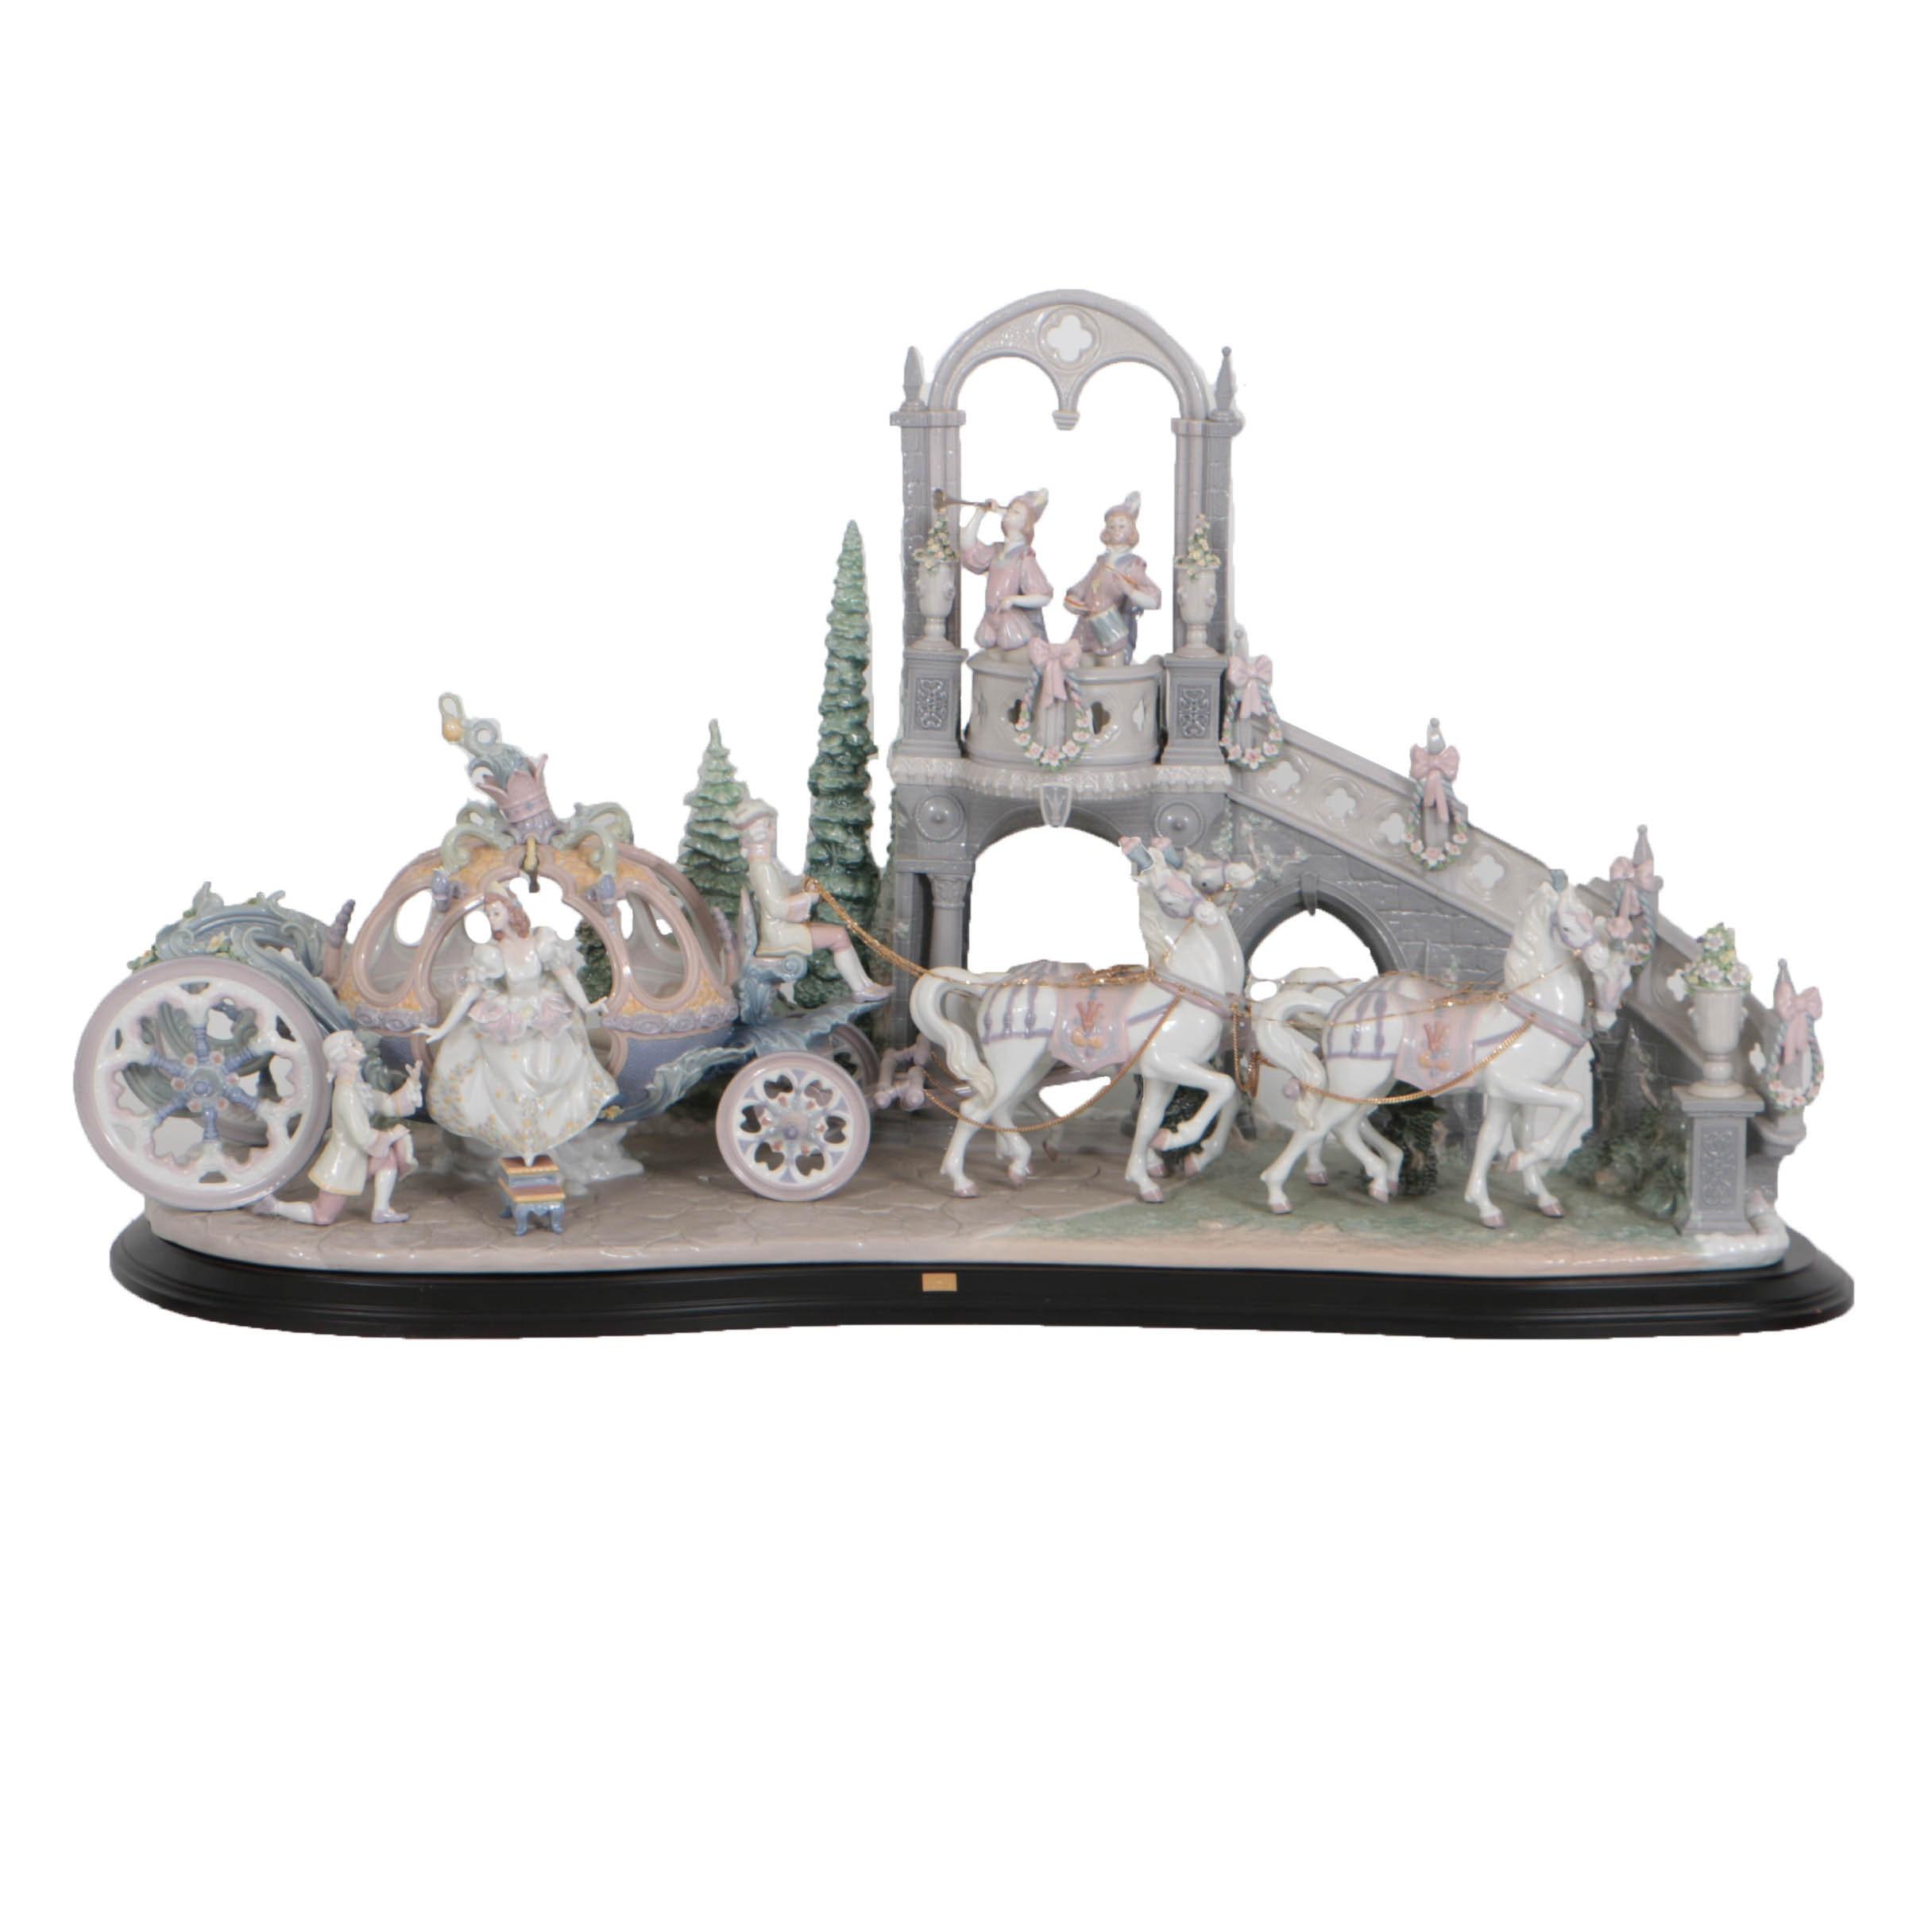 "Monumental Limited Edition Lladró ""Cinderella's Arrival"" Porcelain Figurine"